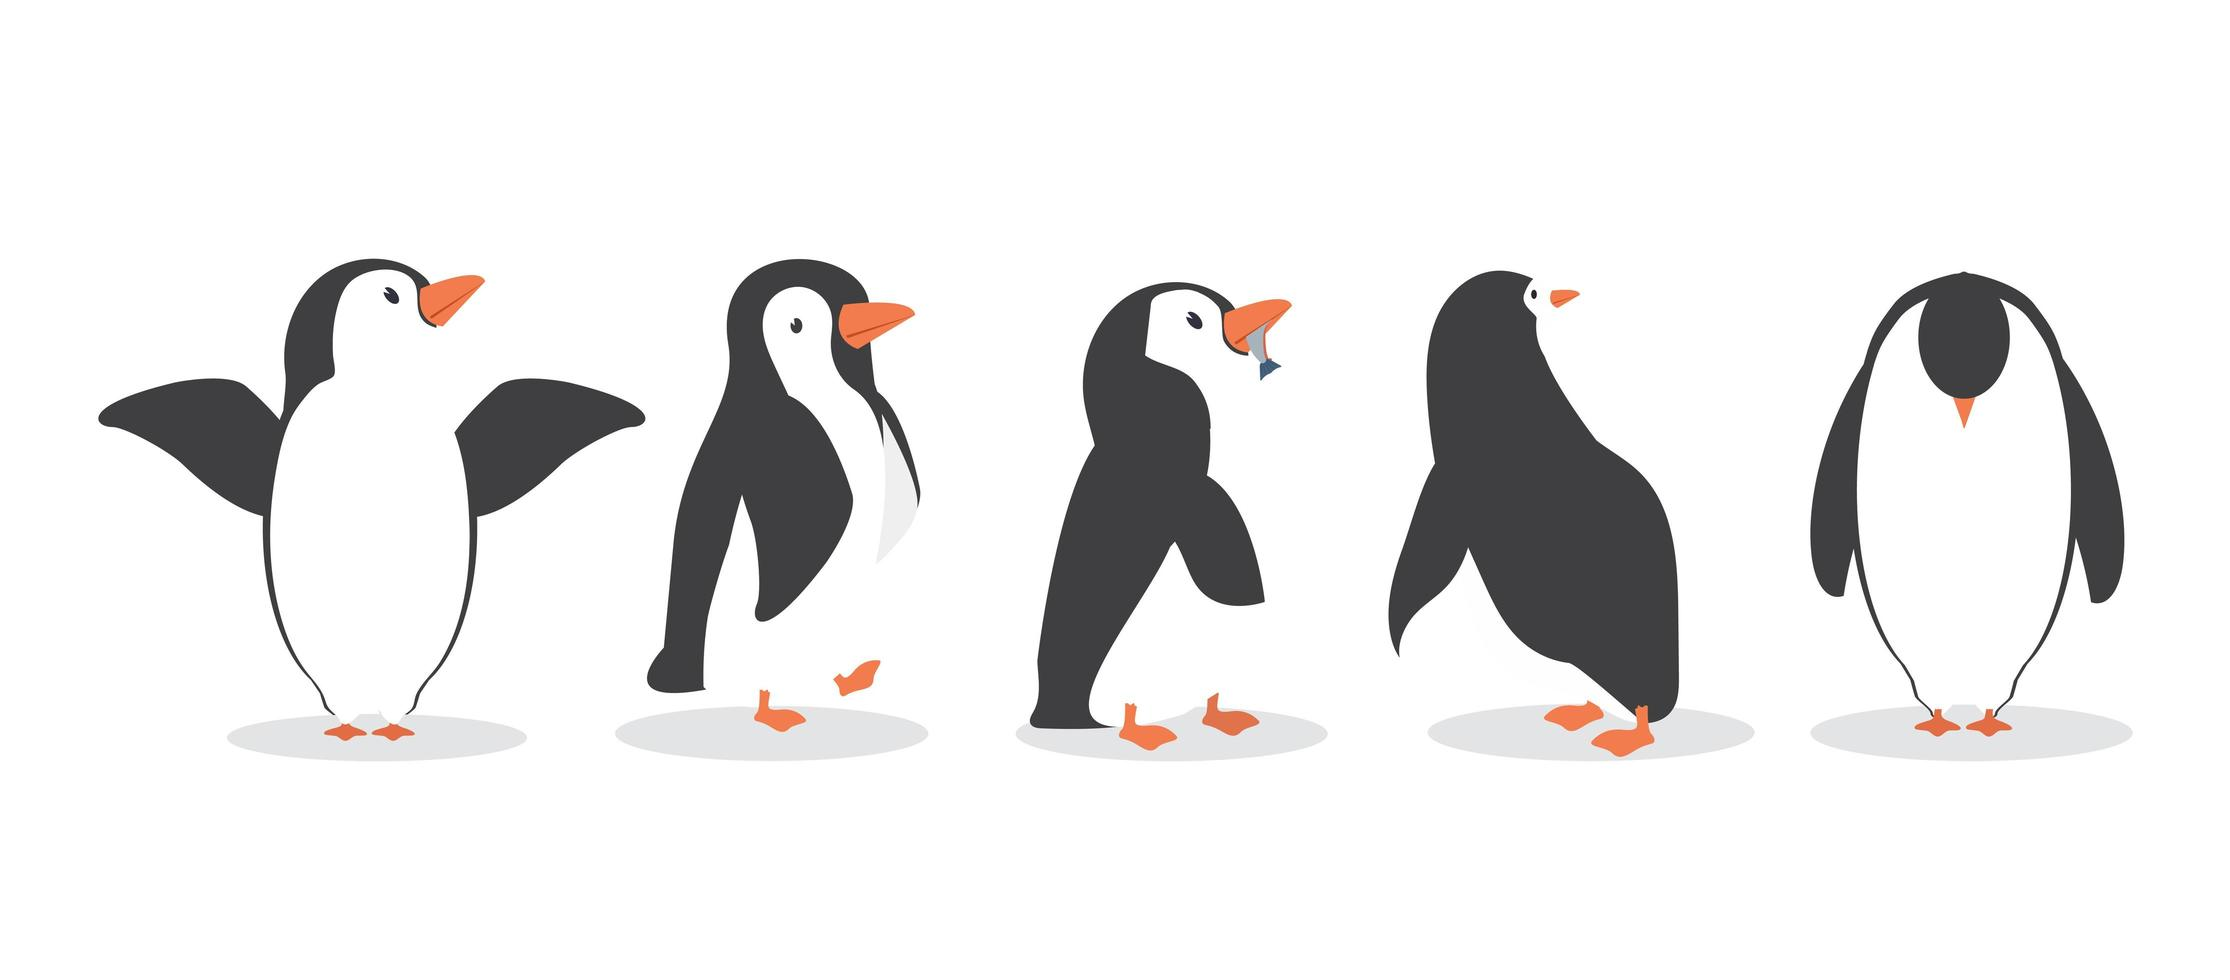 Pinguin Charaktere in verschiedenen Posen gesetzt vektor